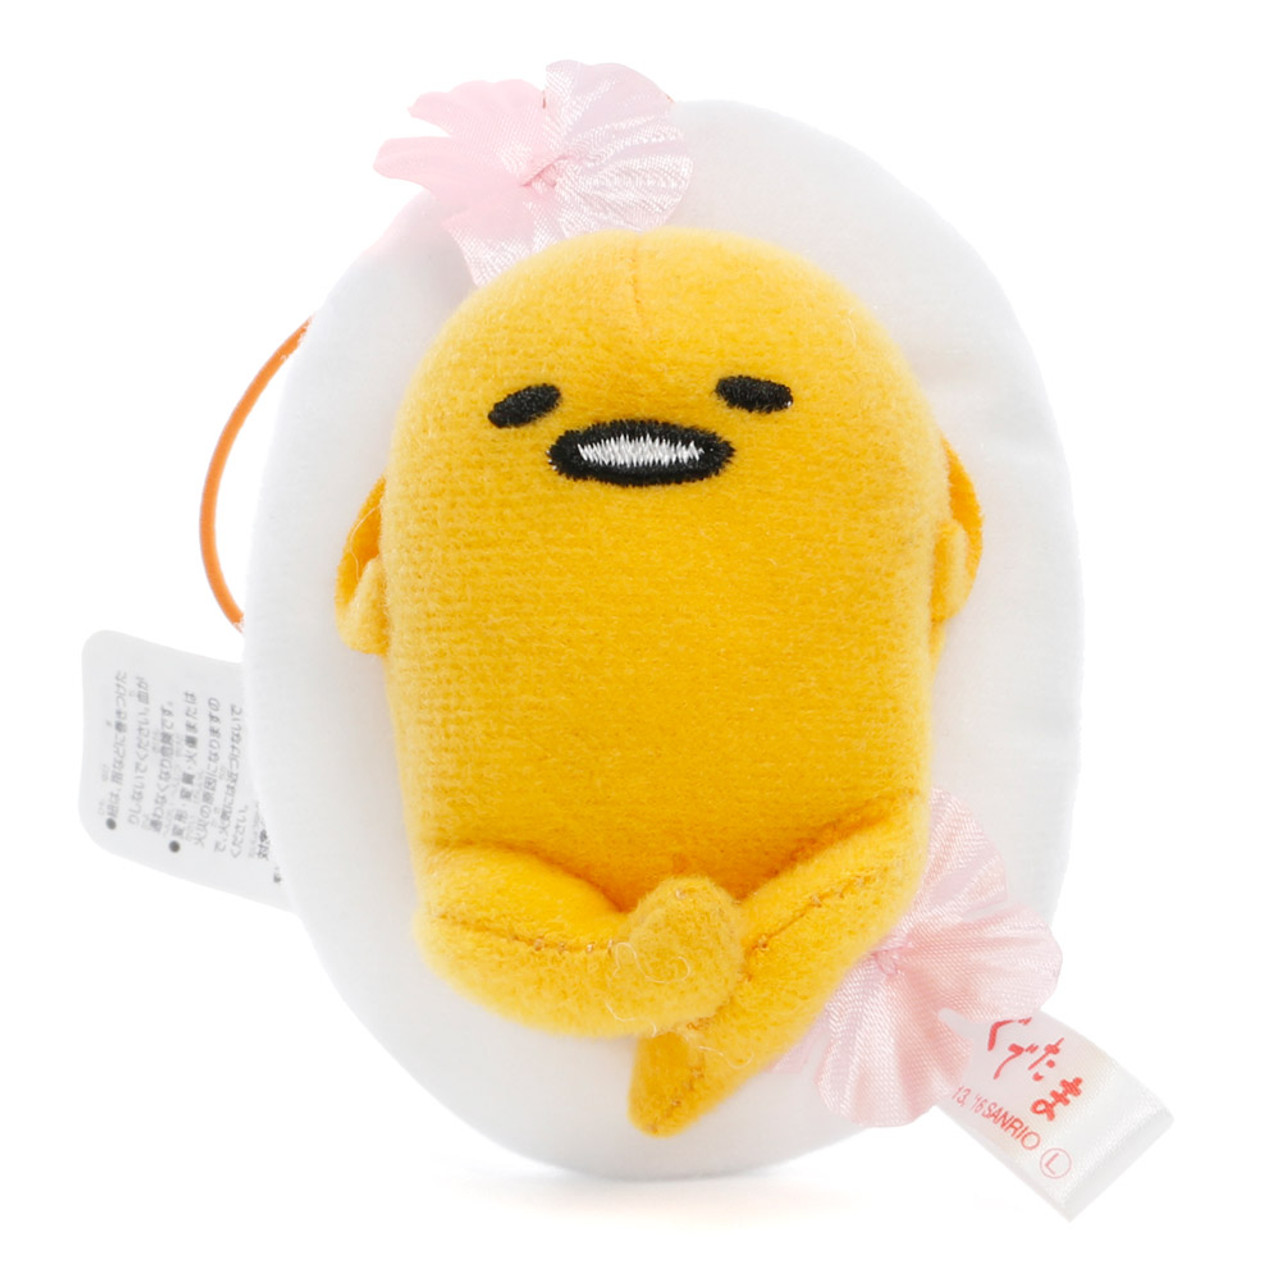 Sanrio Gudetama Lazy Egg Sakura Mascot Plush Charms - Lying On Sakura Egg White ( Front View )